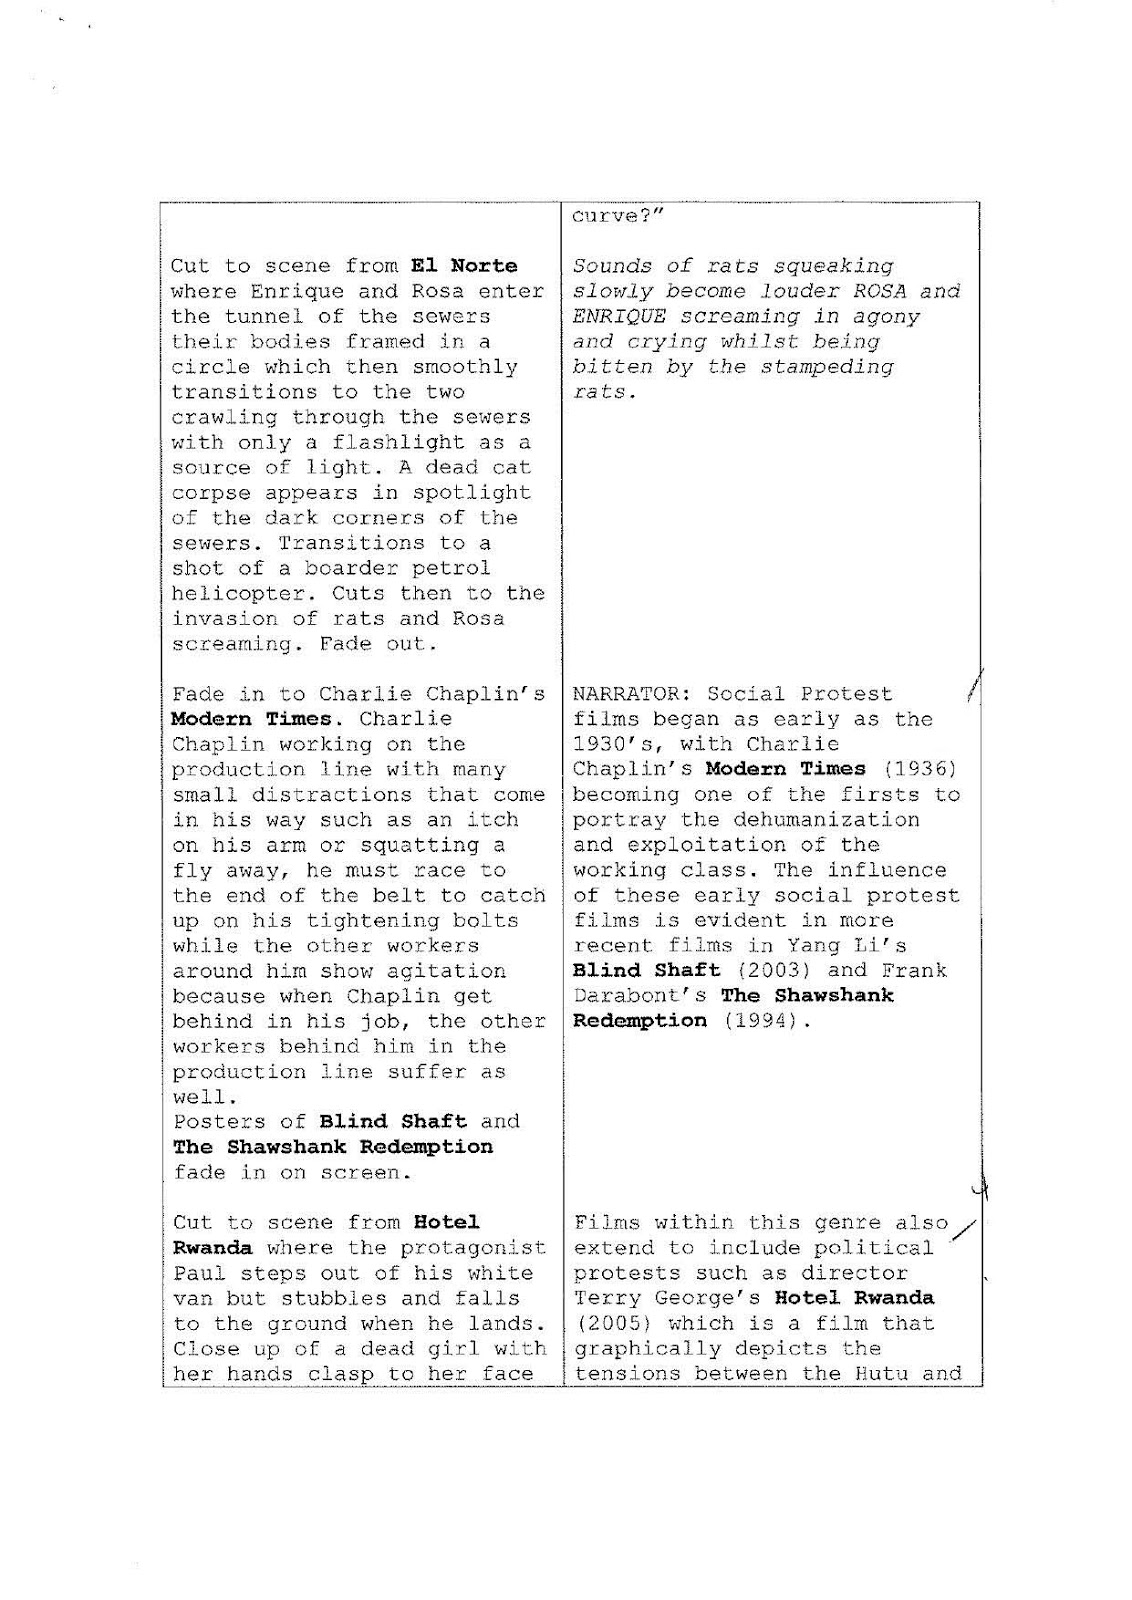 Film Doentary Script Ib Blog